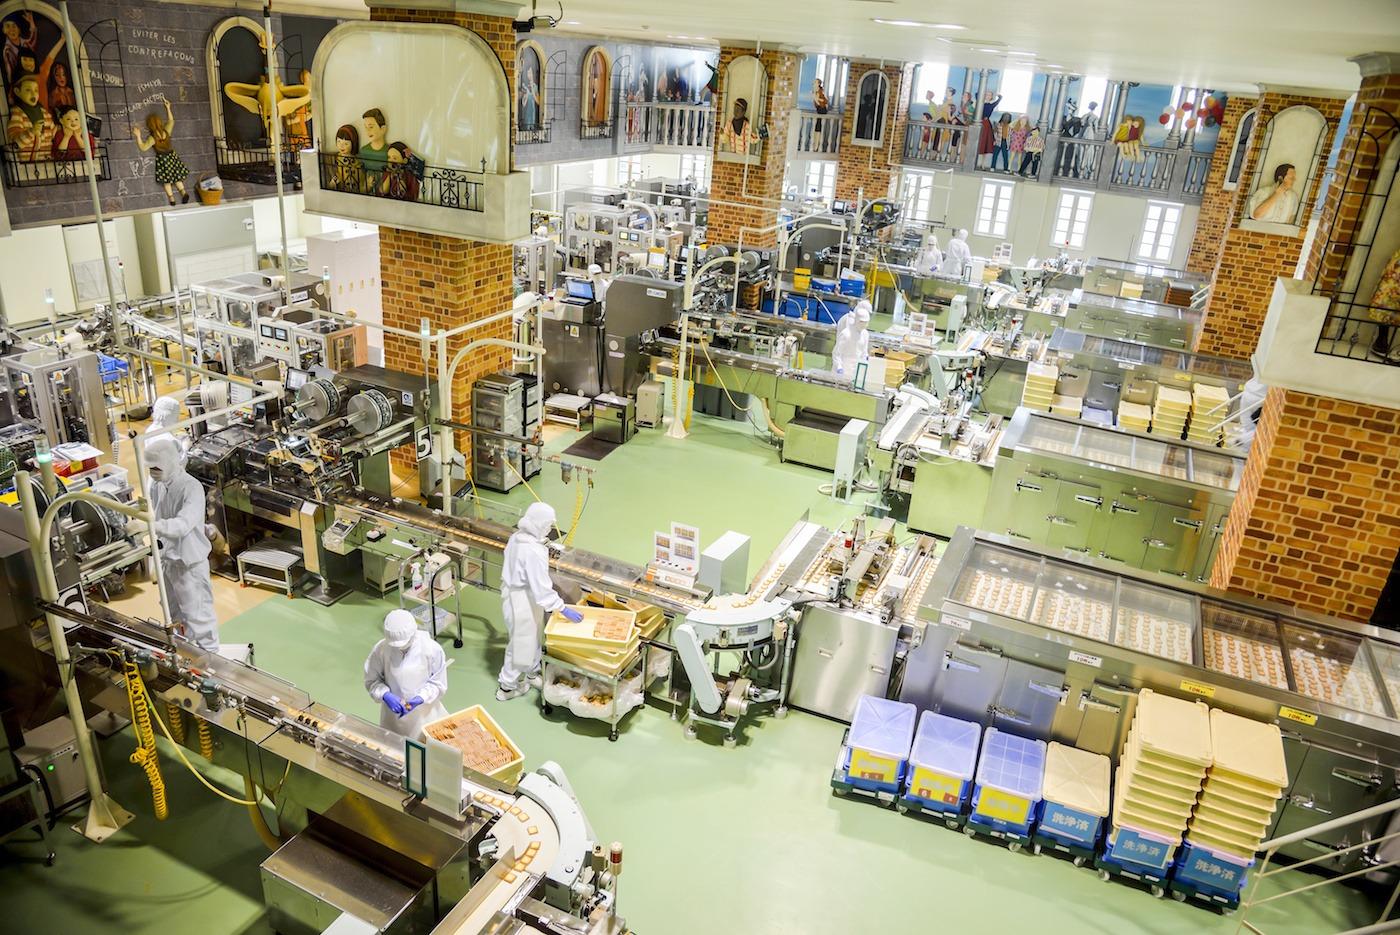 Operators work in Chocolate factory